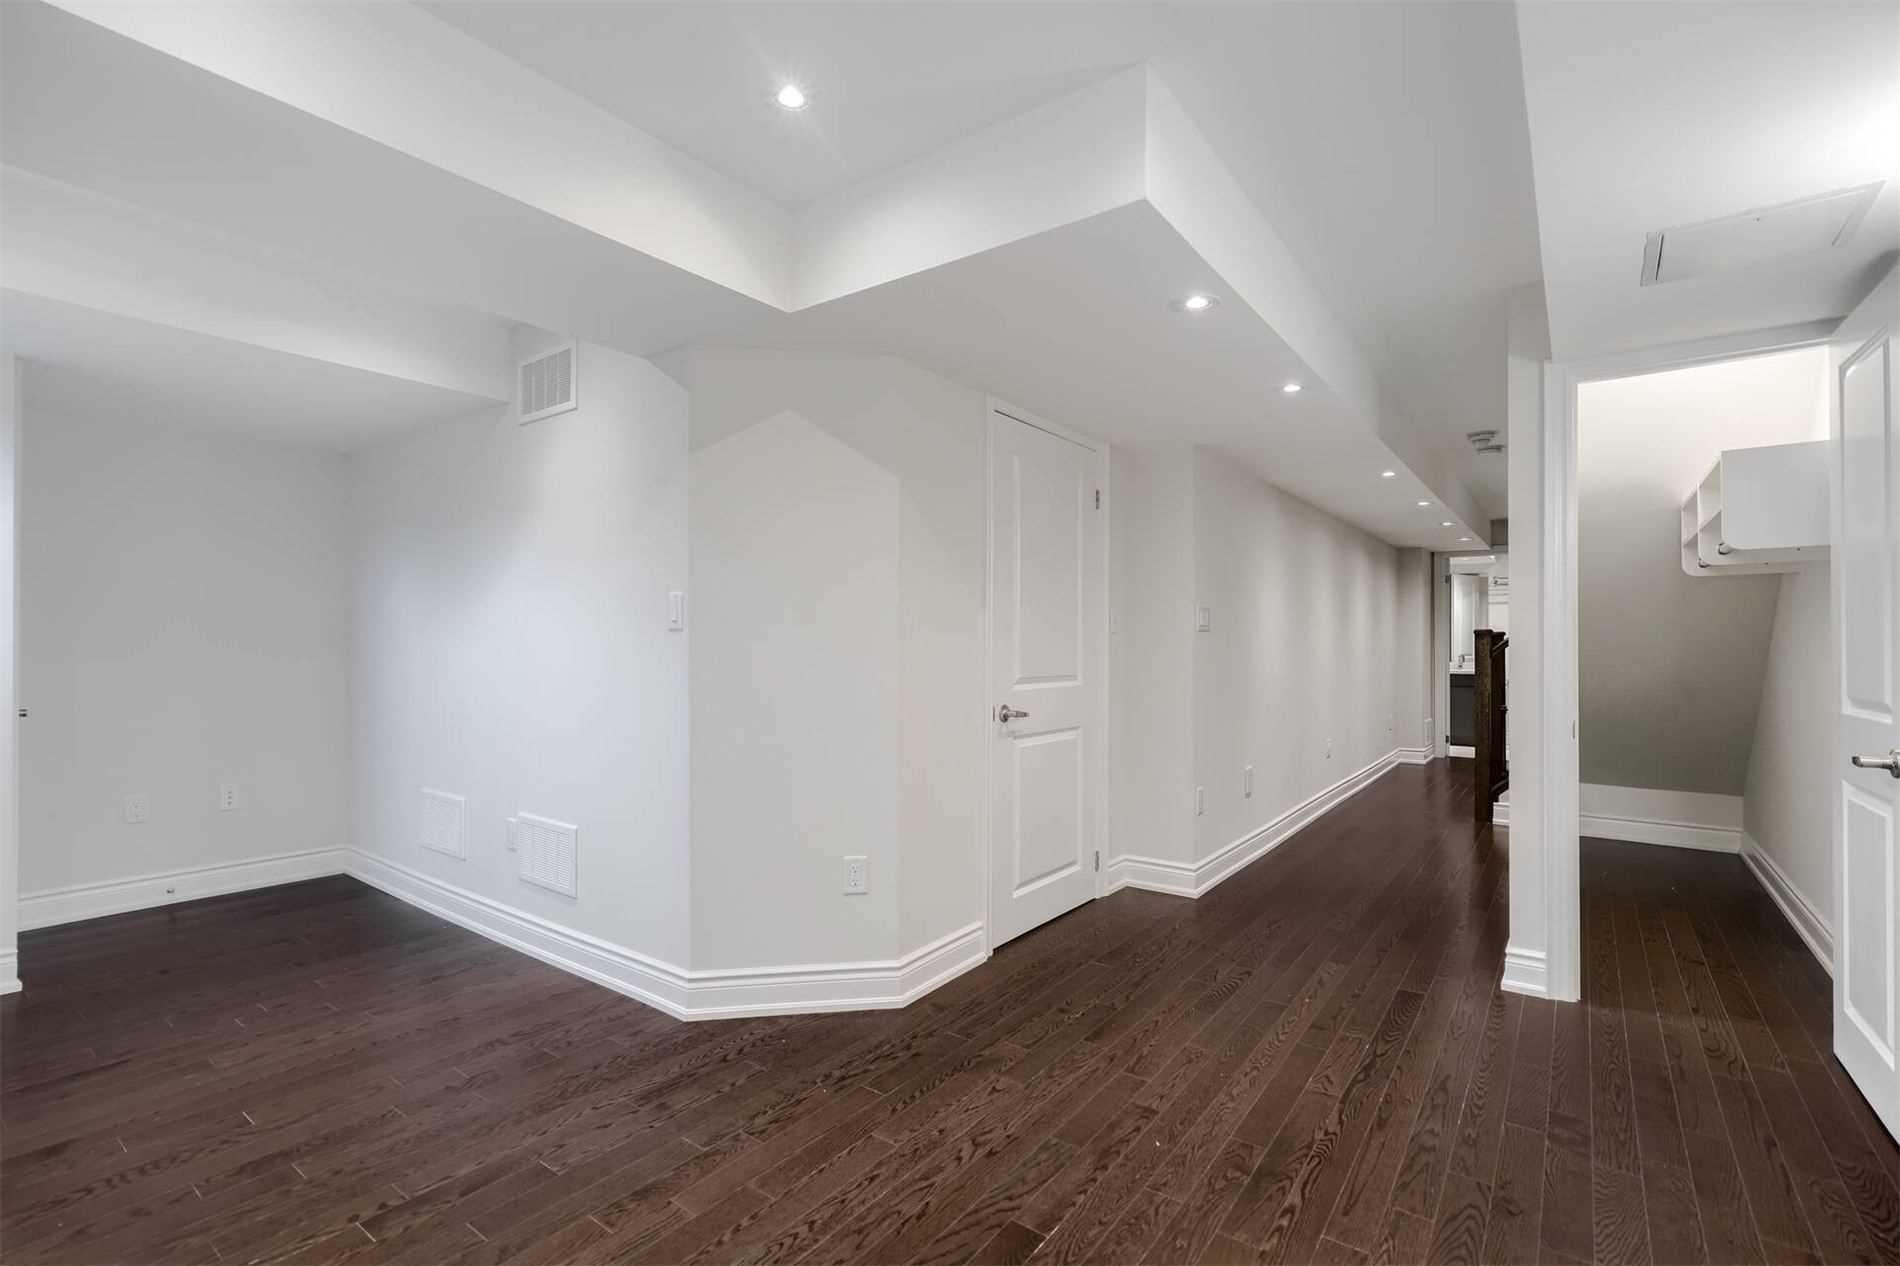 Att/row/twnhouse For Sale In Toronto , 4 Bedrooms Bedrooms, ,4 BathroomsBathrooms,Att/row/twnhouse,For Sale,Pony Farm